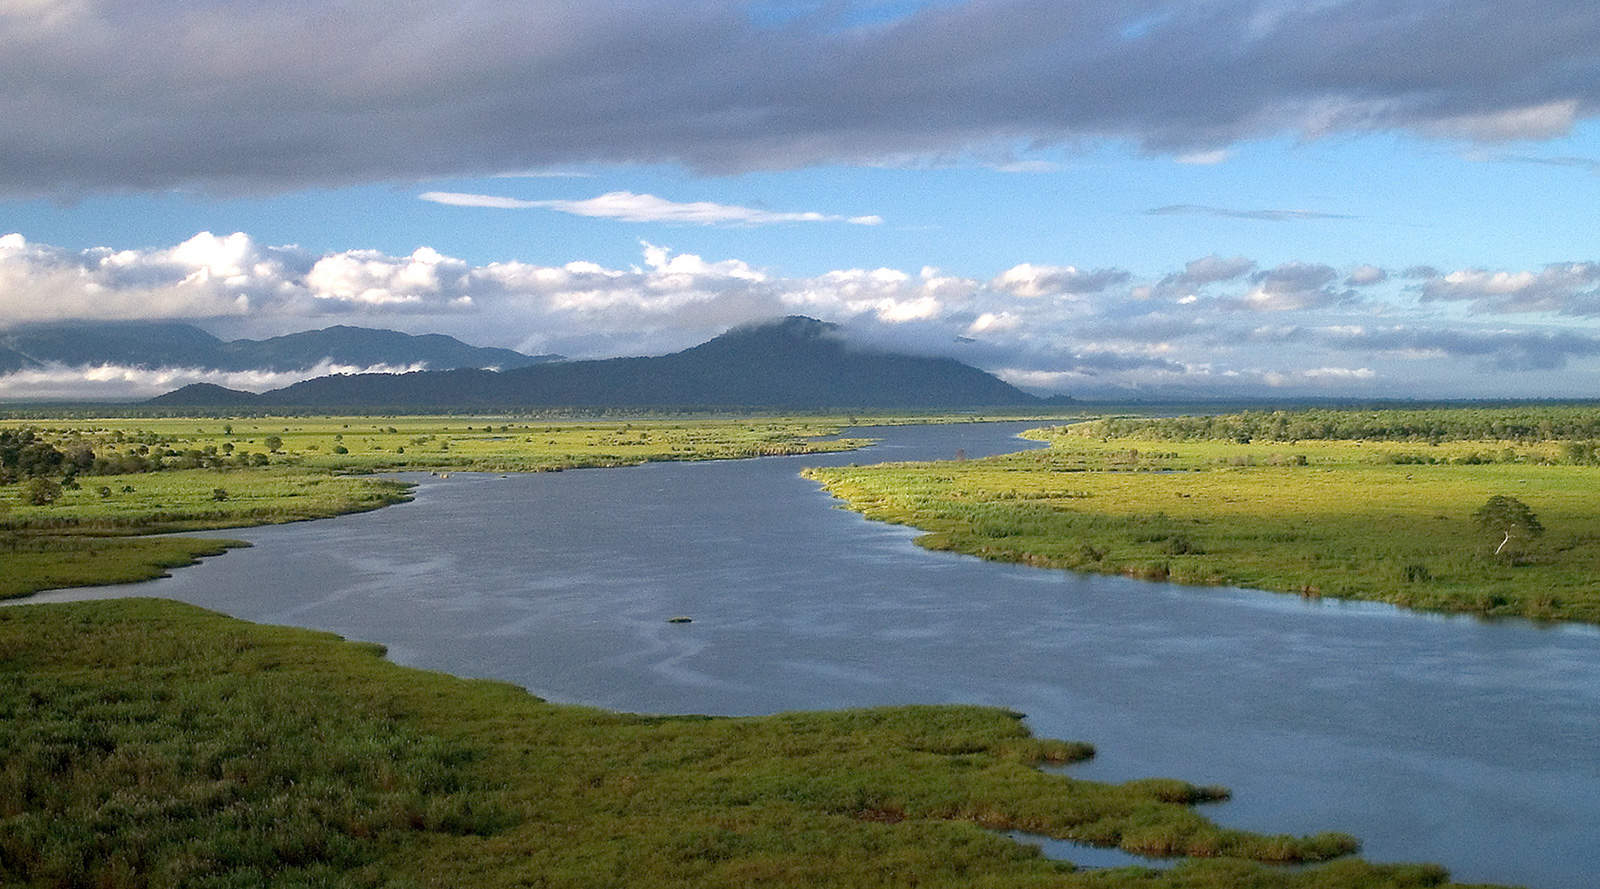 © Wilderness Safaris | Liwonde National Park, Malawi